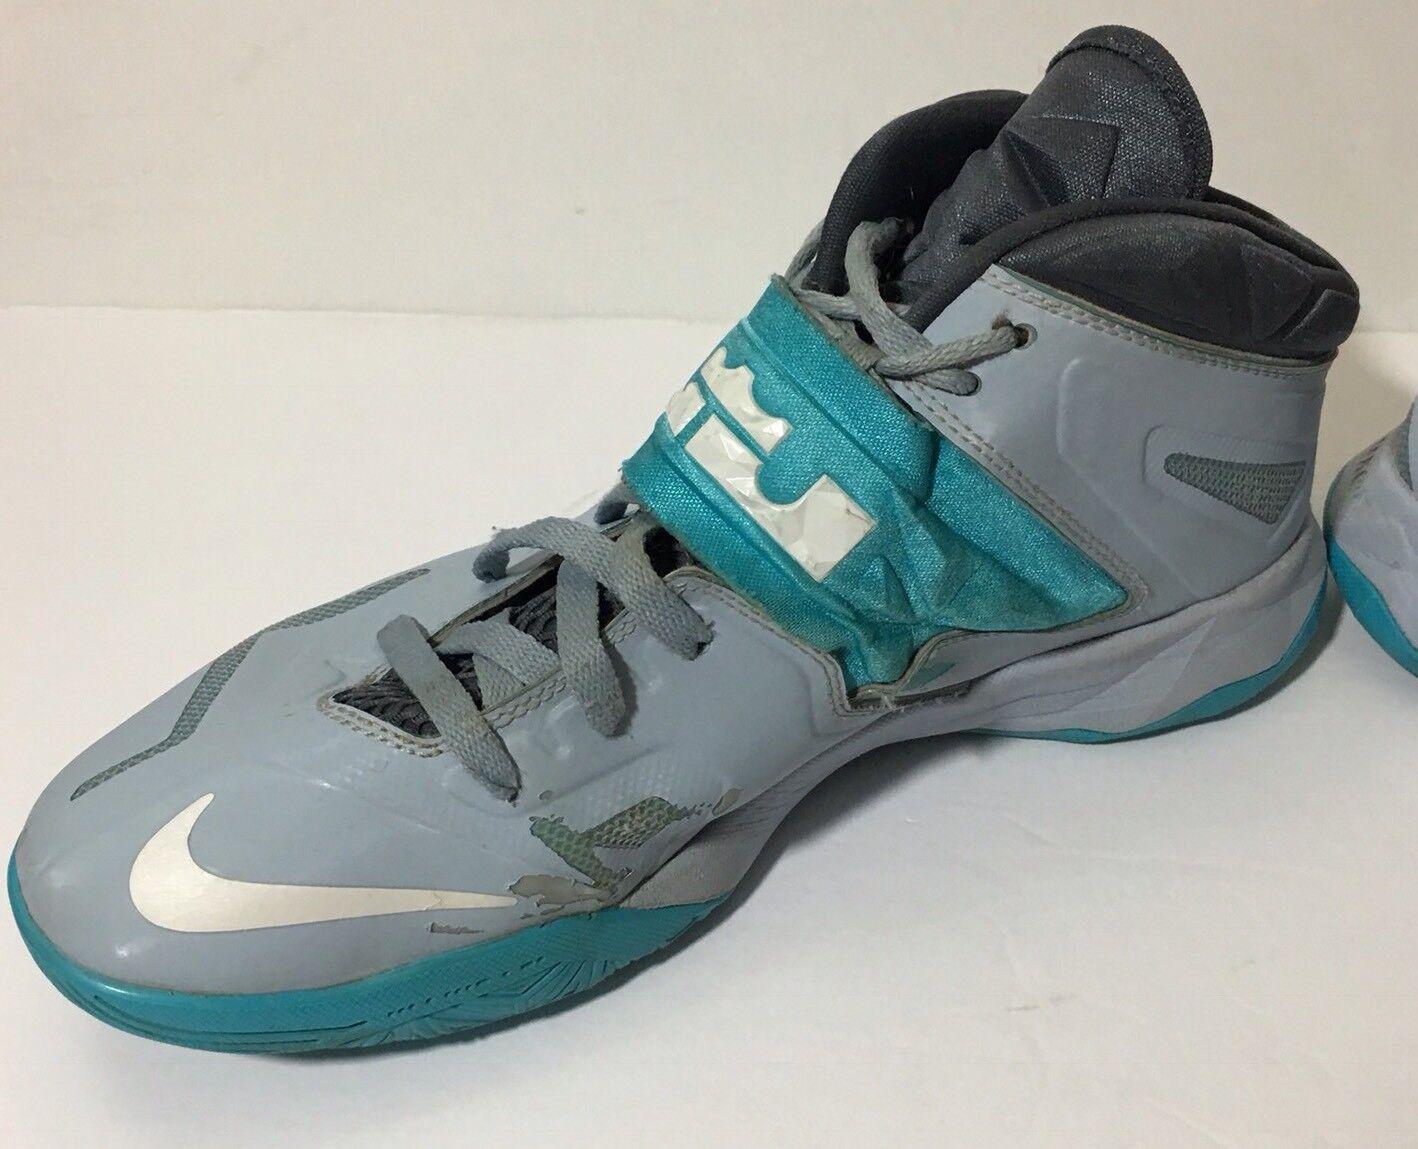 lowest price 805b7 76815 ... Nike 13 Lebron Zoom Soldier Sneaker Sneaker Sneaker 7 VII 2013 Light  Armory Blue 599264-